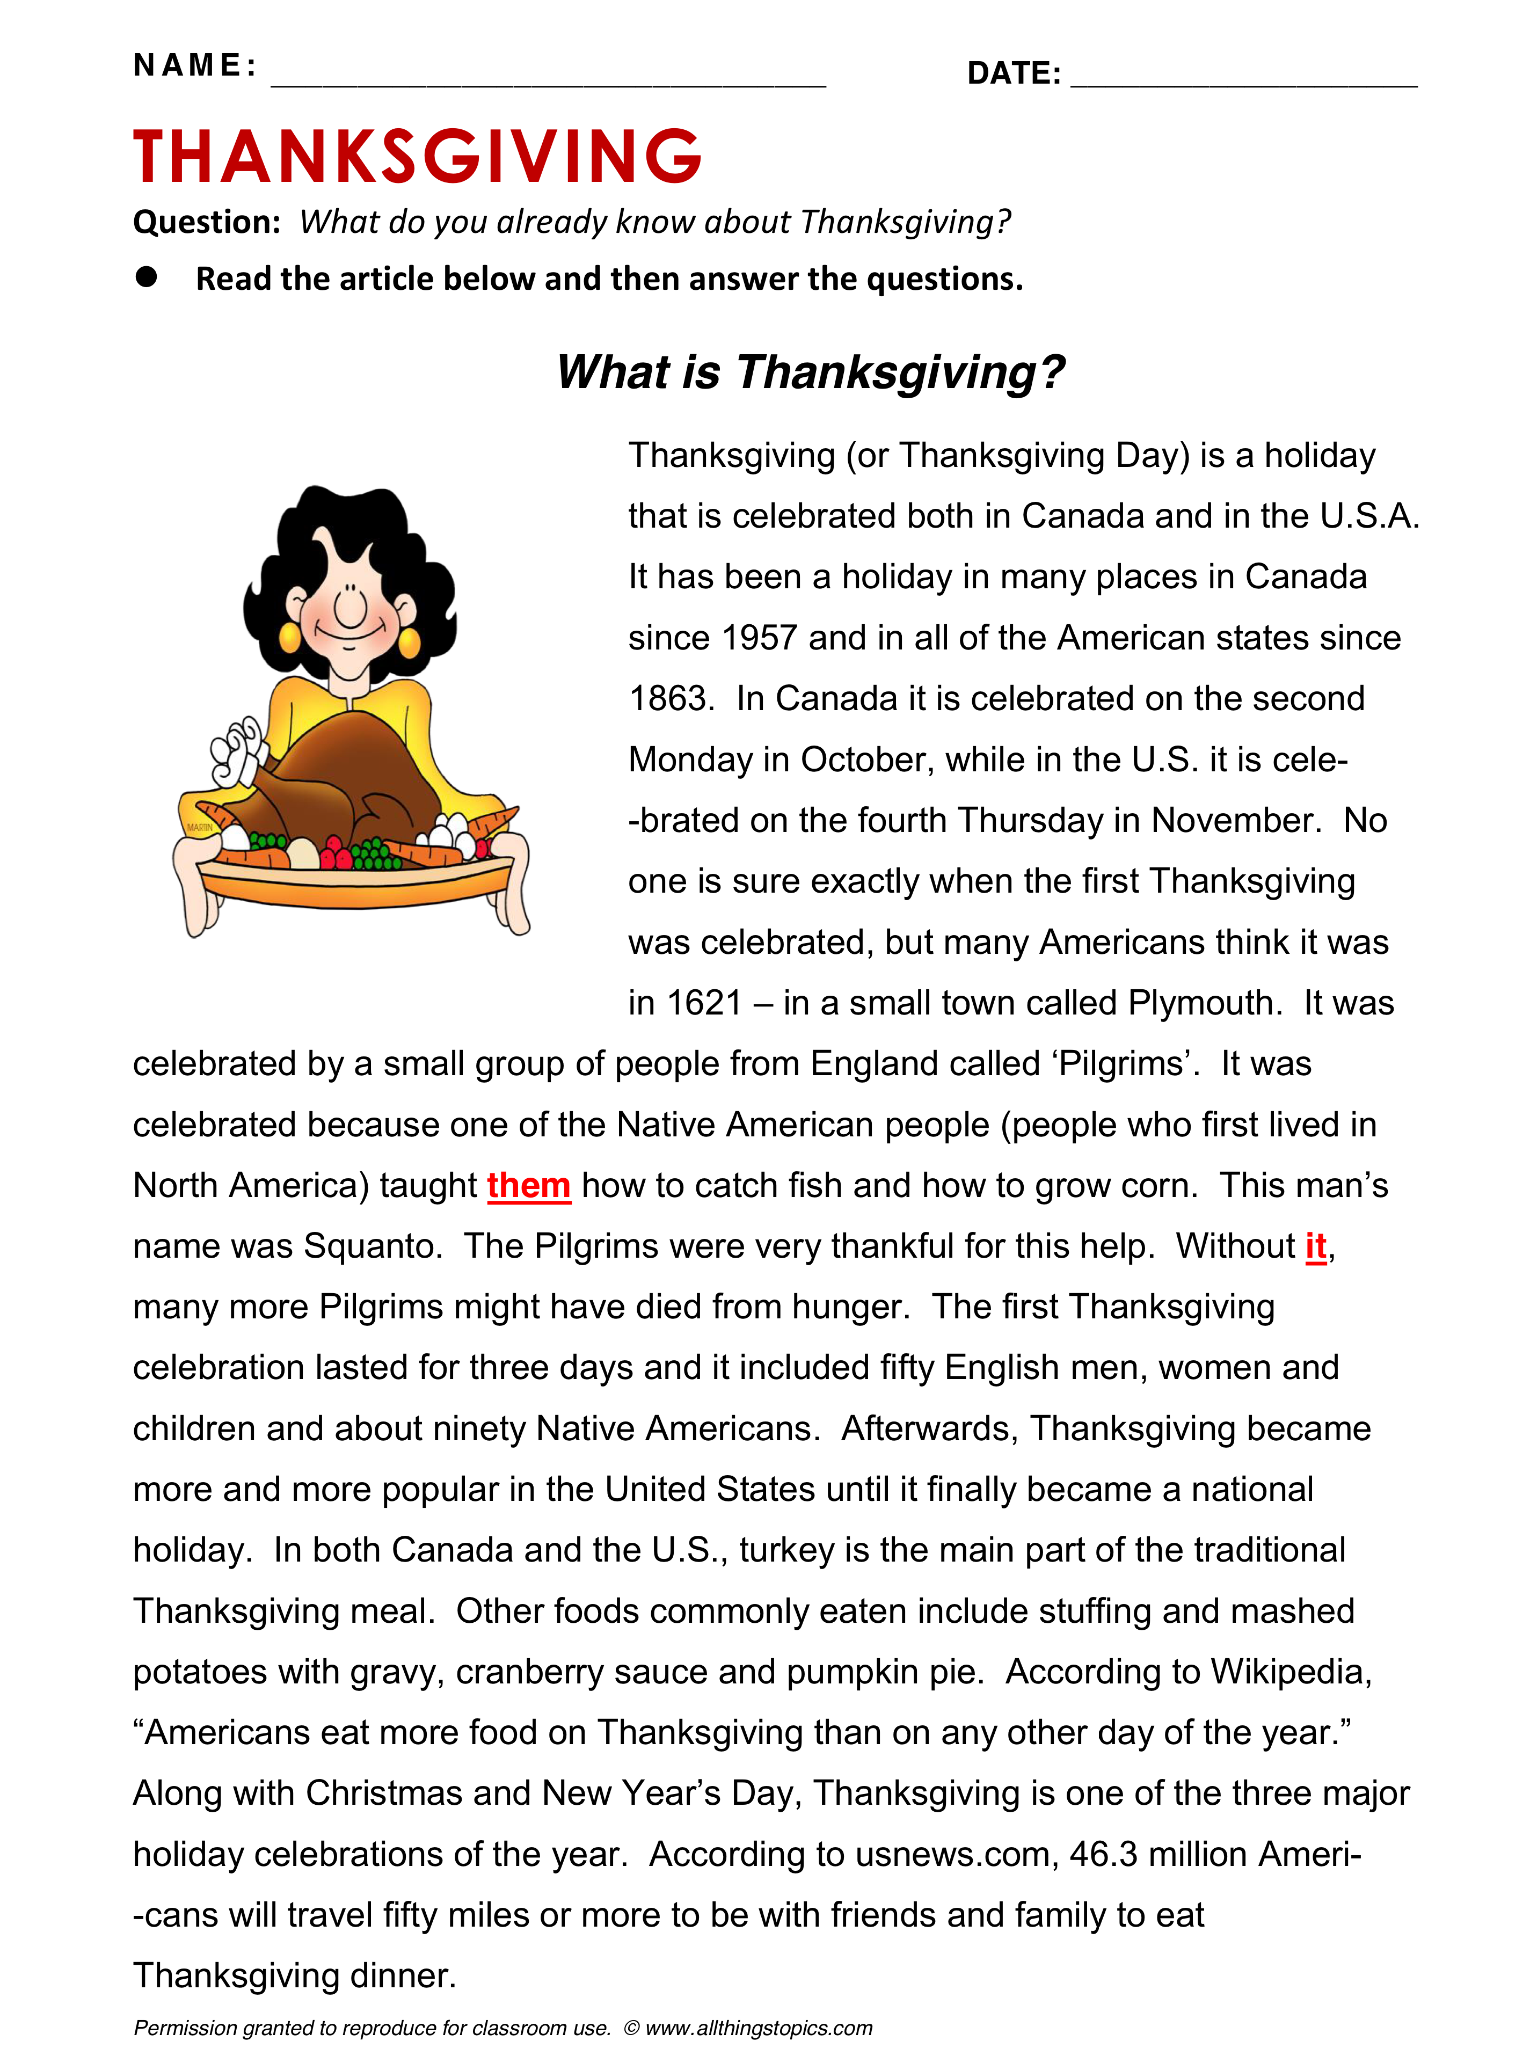 Thanksgiving English Learning English Vocabulary Esl English Phrases Http Www Allthingstopics Com Thanksgivin Learn English English Reading Esl Reading [ 2048 x 1536 Pixel ]